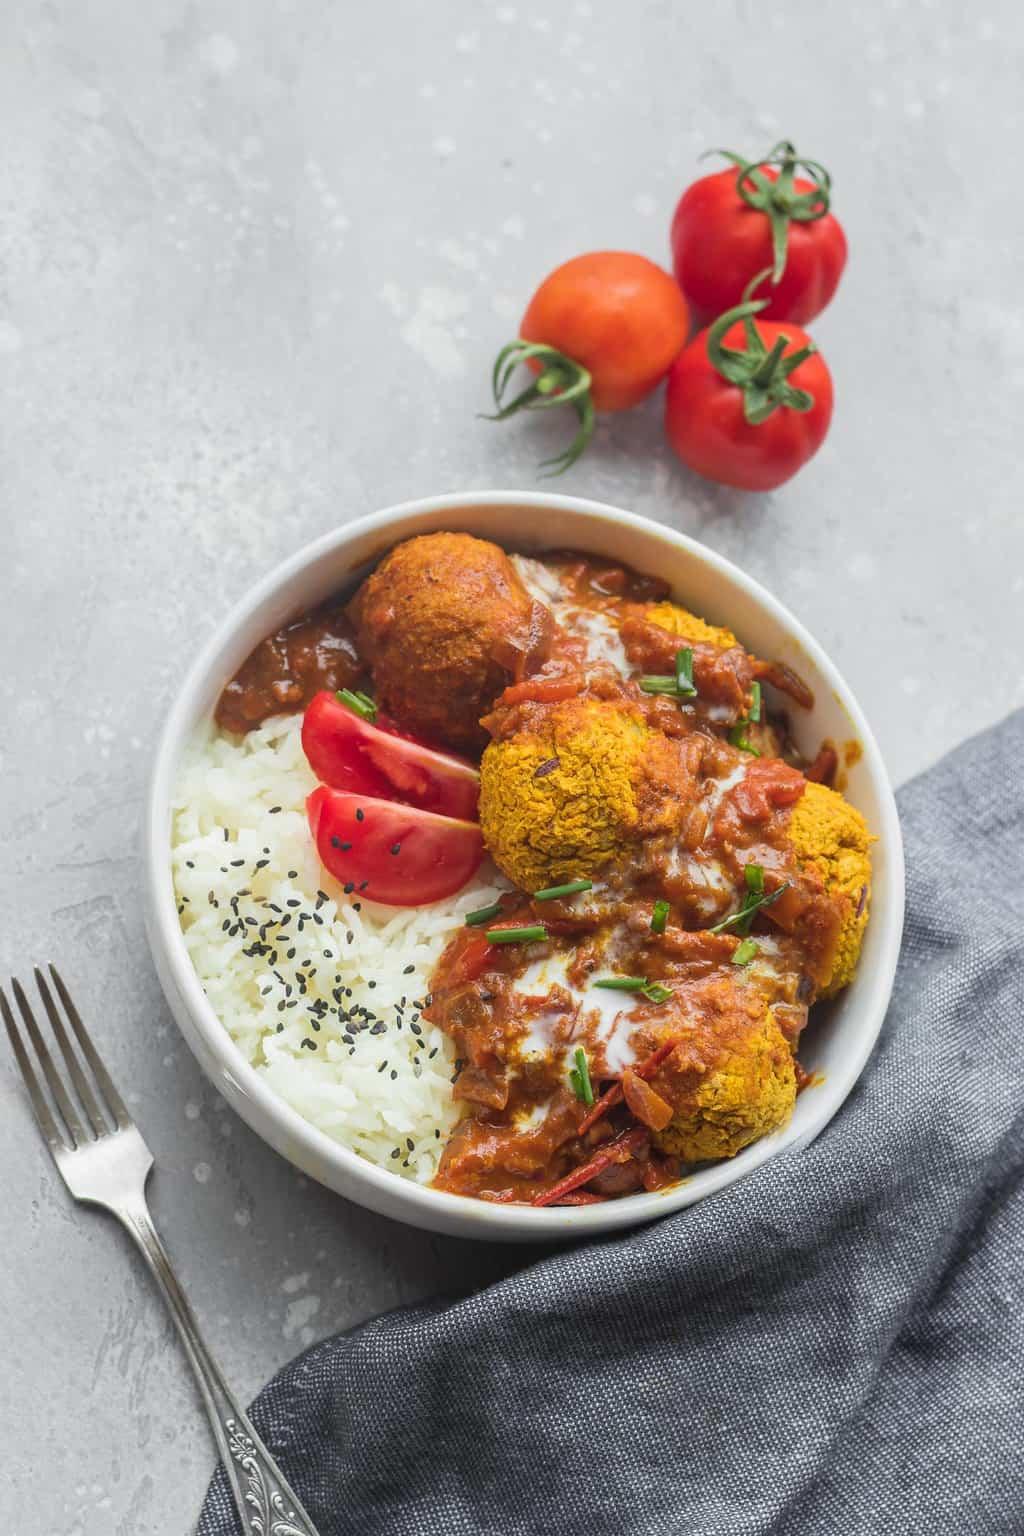 Vegan lentil meatballs in tomato curry sauce